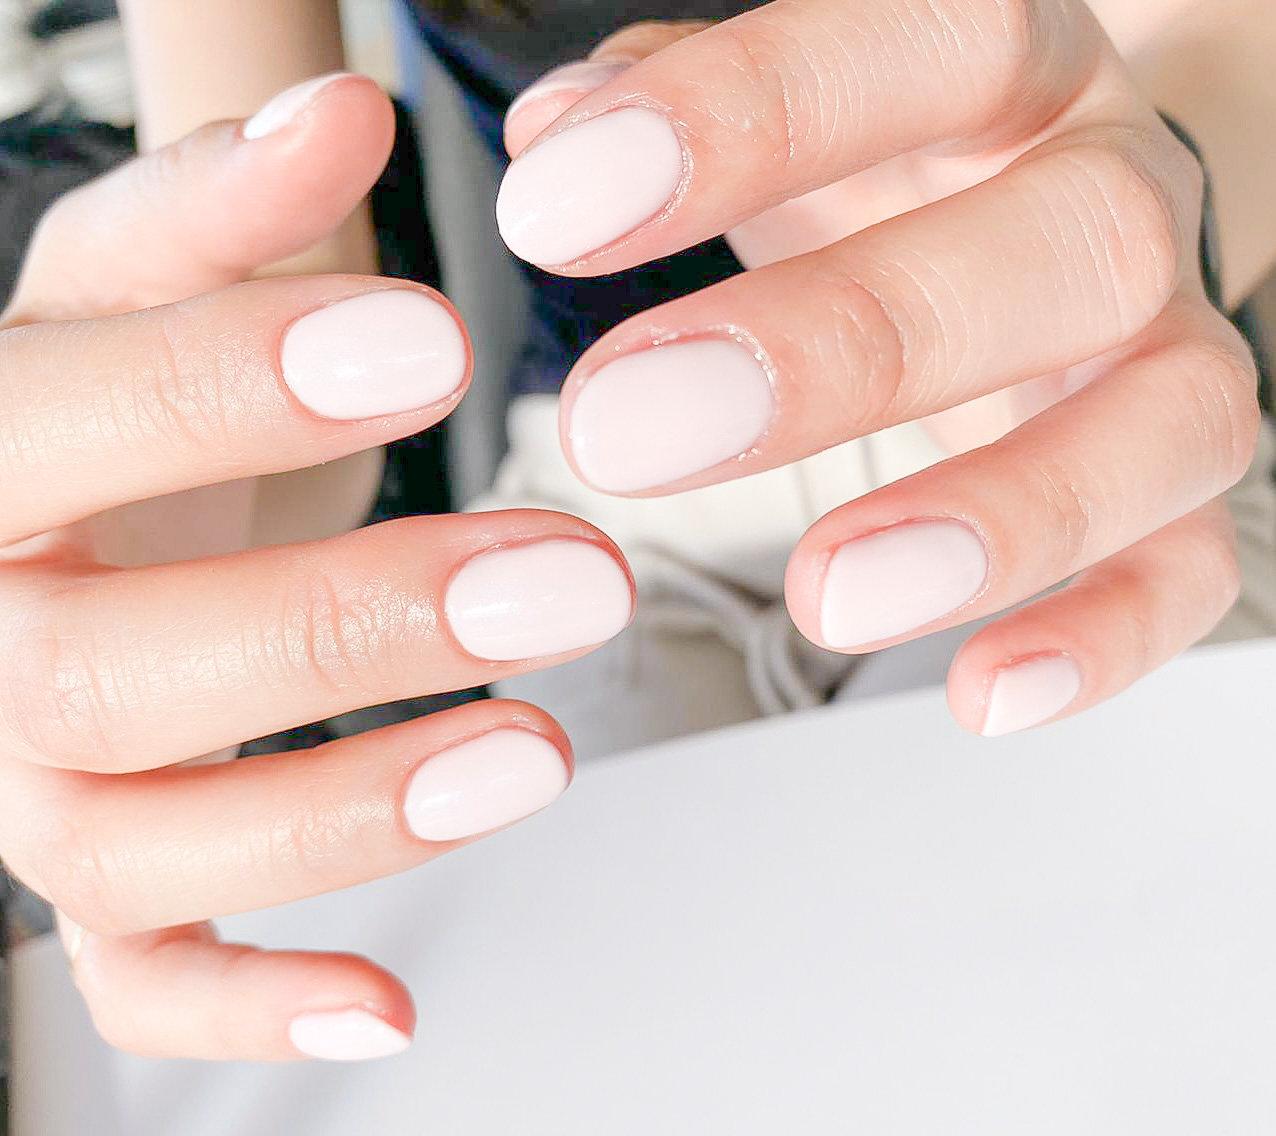 Regular or Shellac Manicure